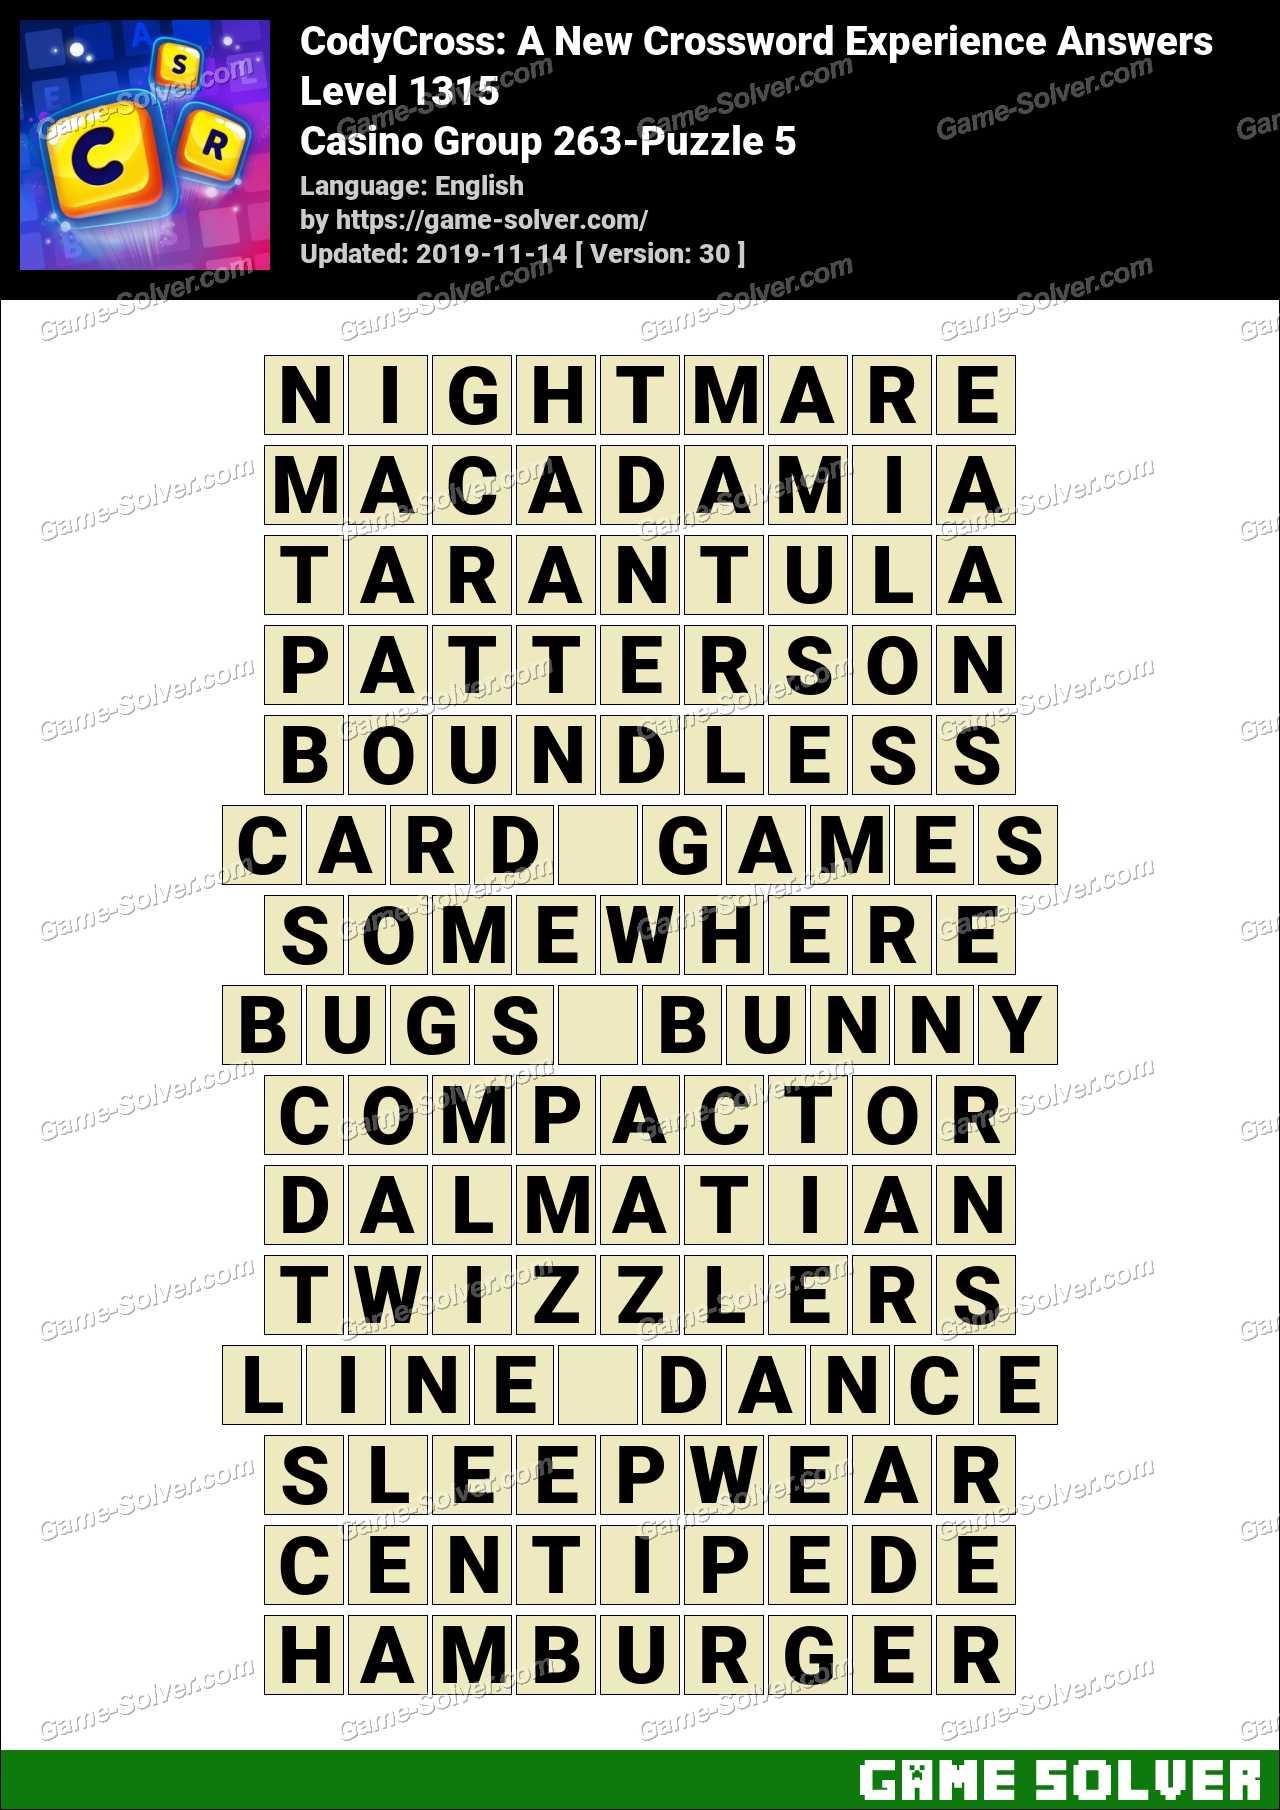 CodyCross Casino Group 263-Puzzle 5 Answers